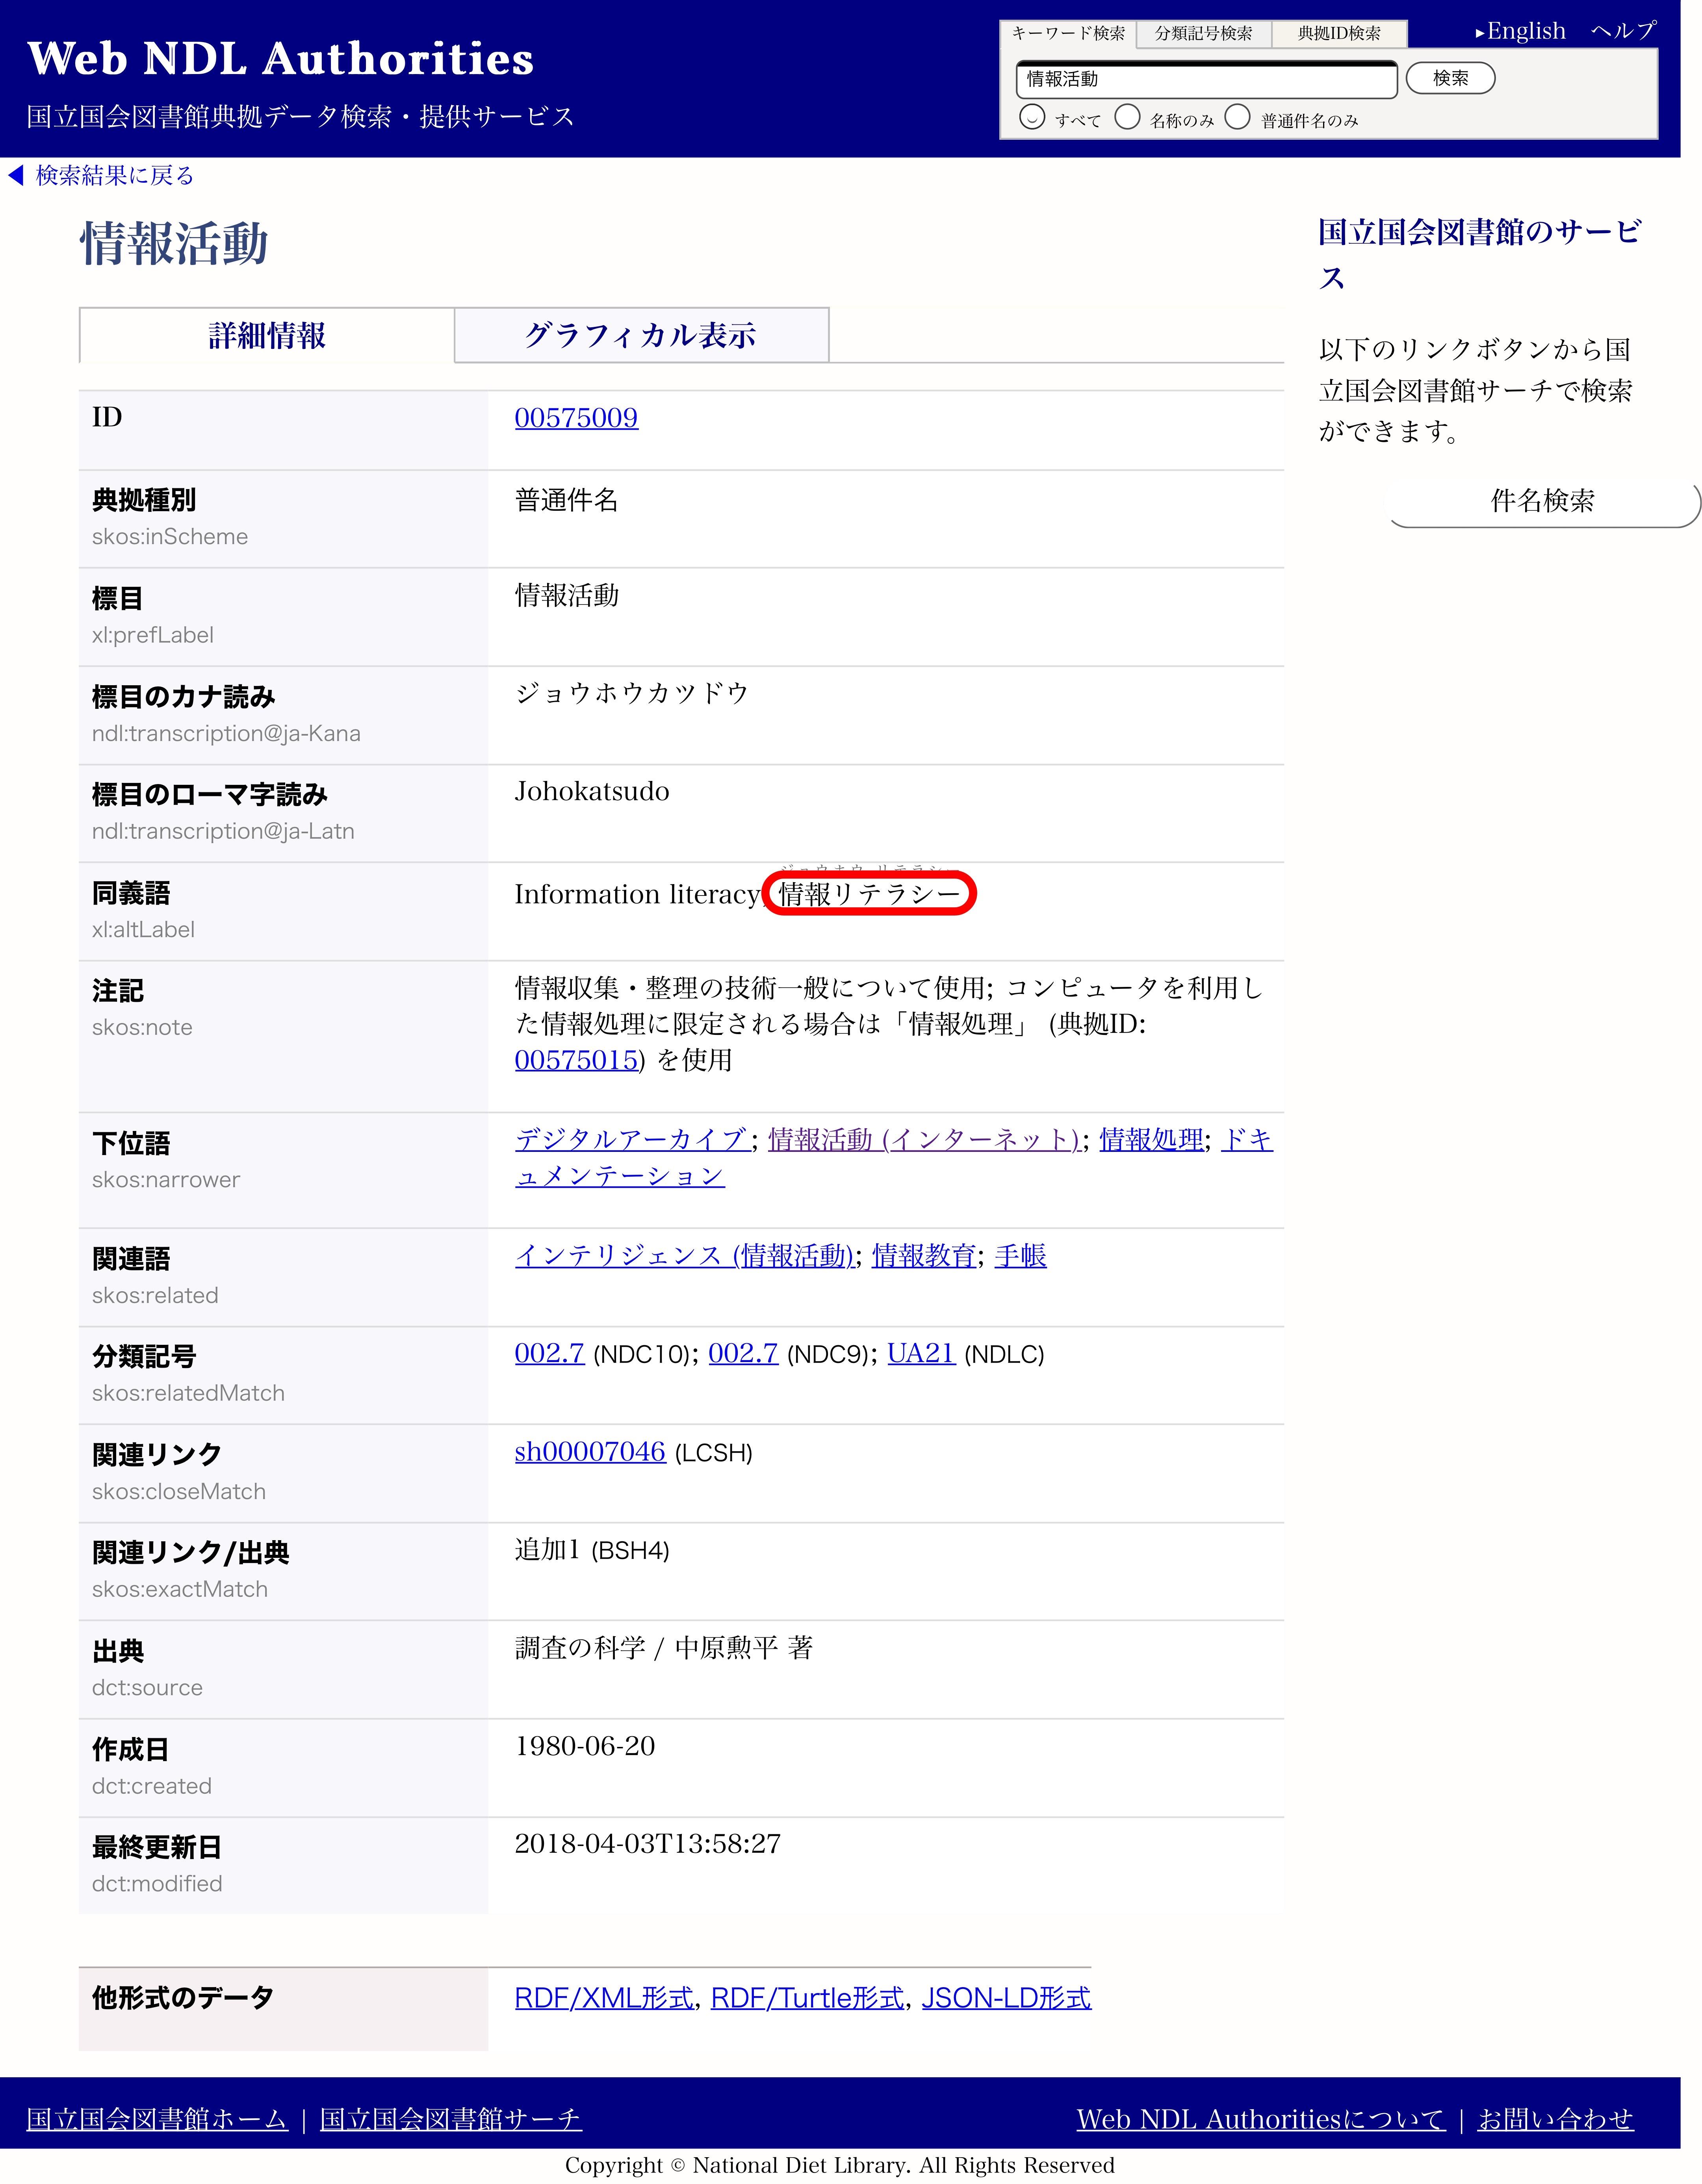 f:id:sorashima:20201001235856j:plain:w1792